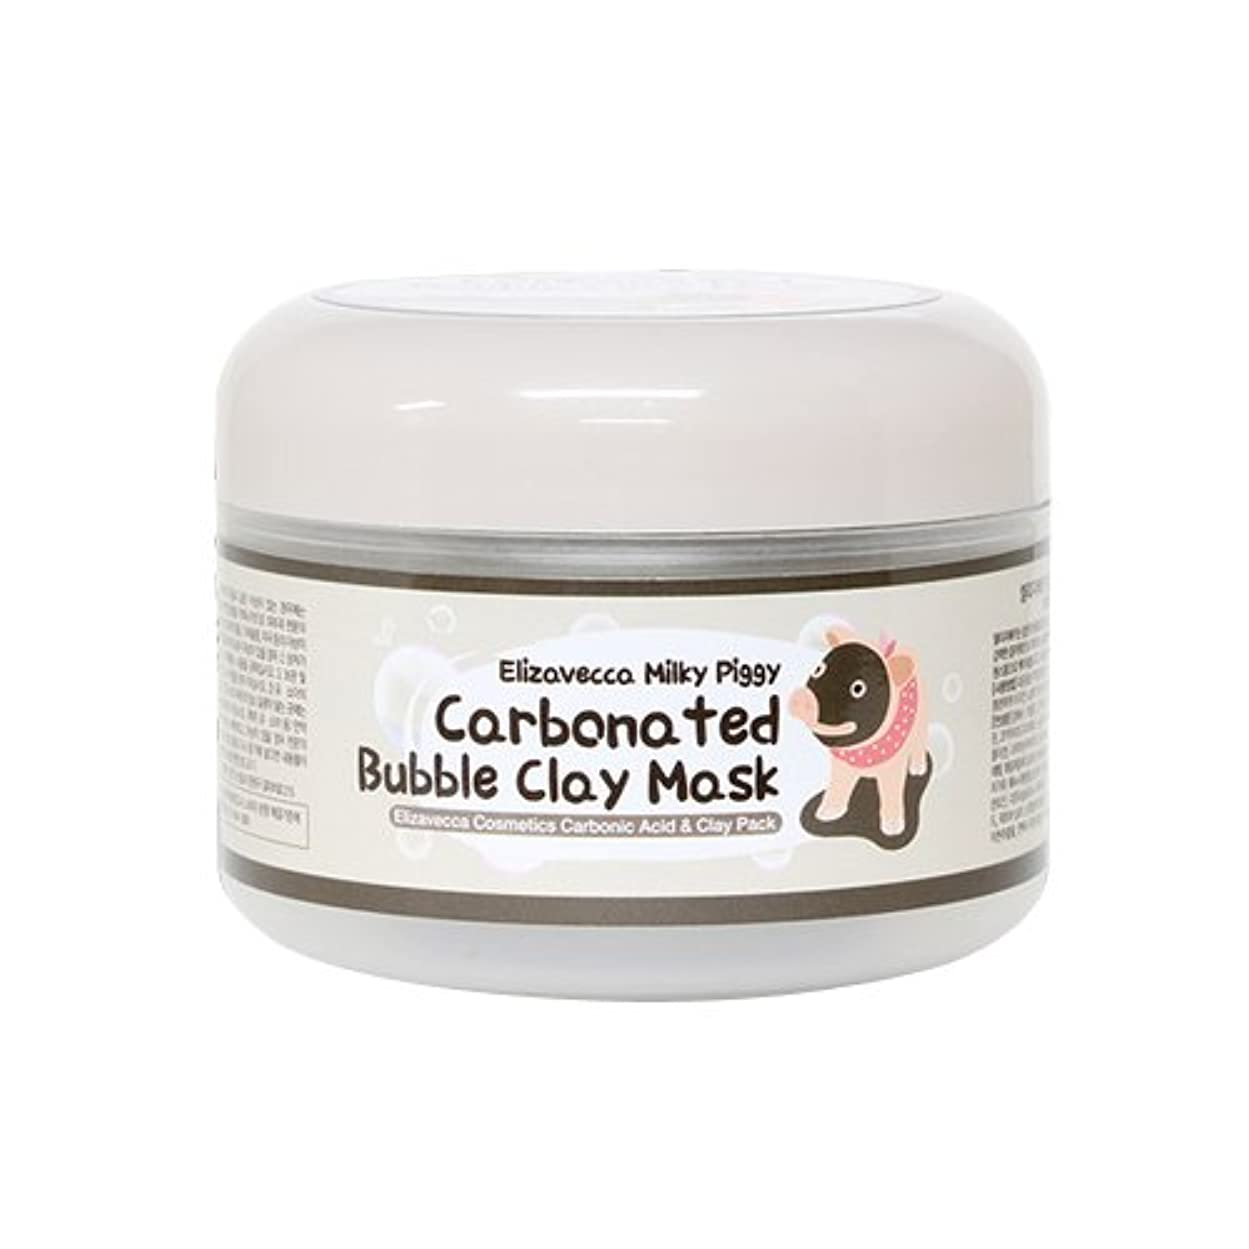 [Elizaecca/エリザベカ/SESALO]炭酸バブルクレイマスク/Carbanated bubble clay mask[海外直送品]